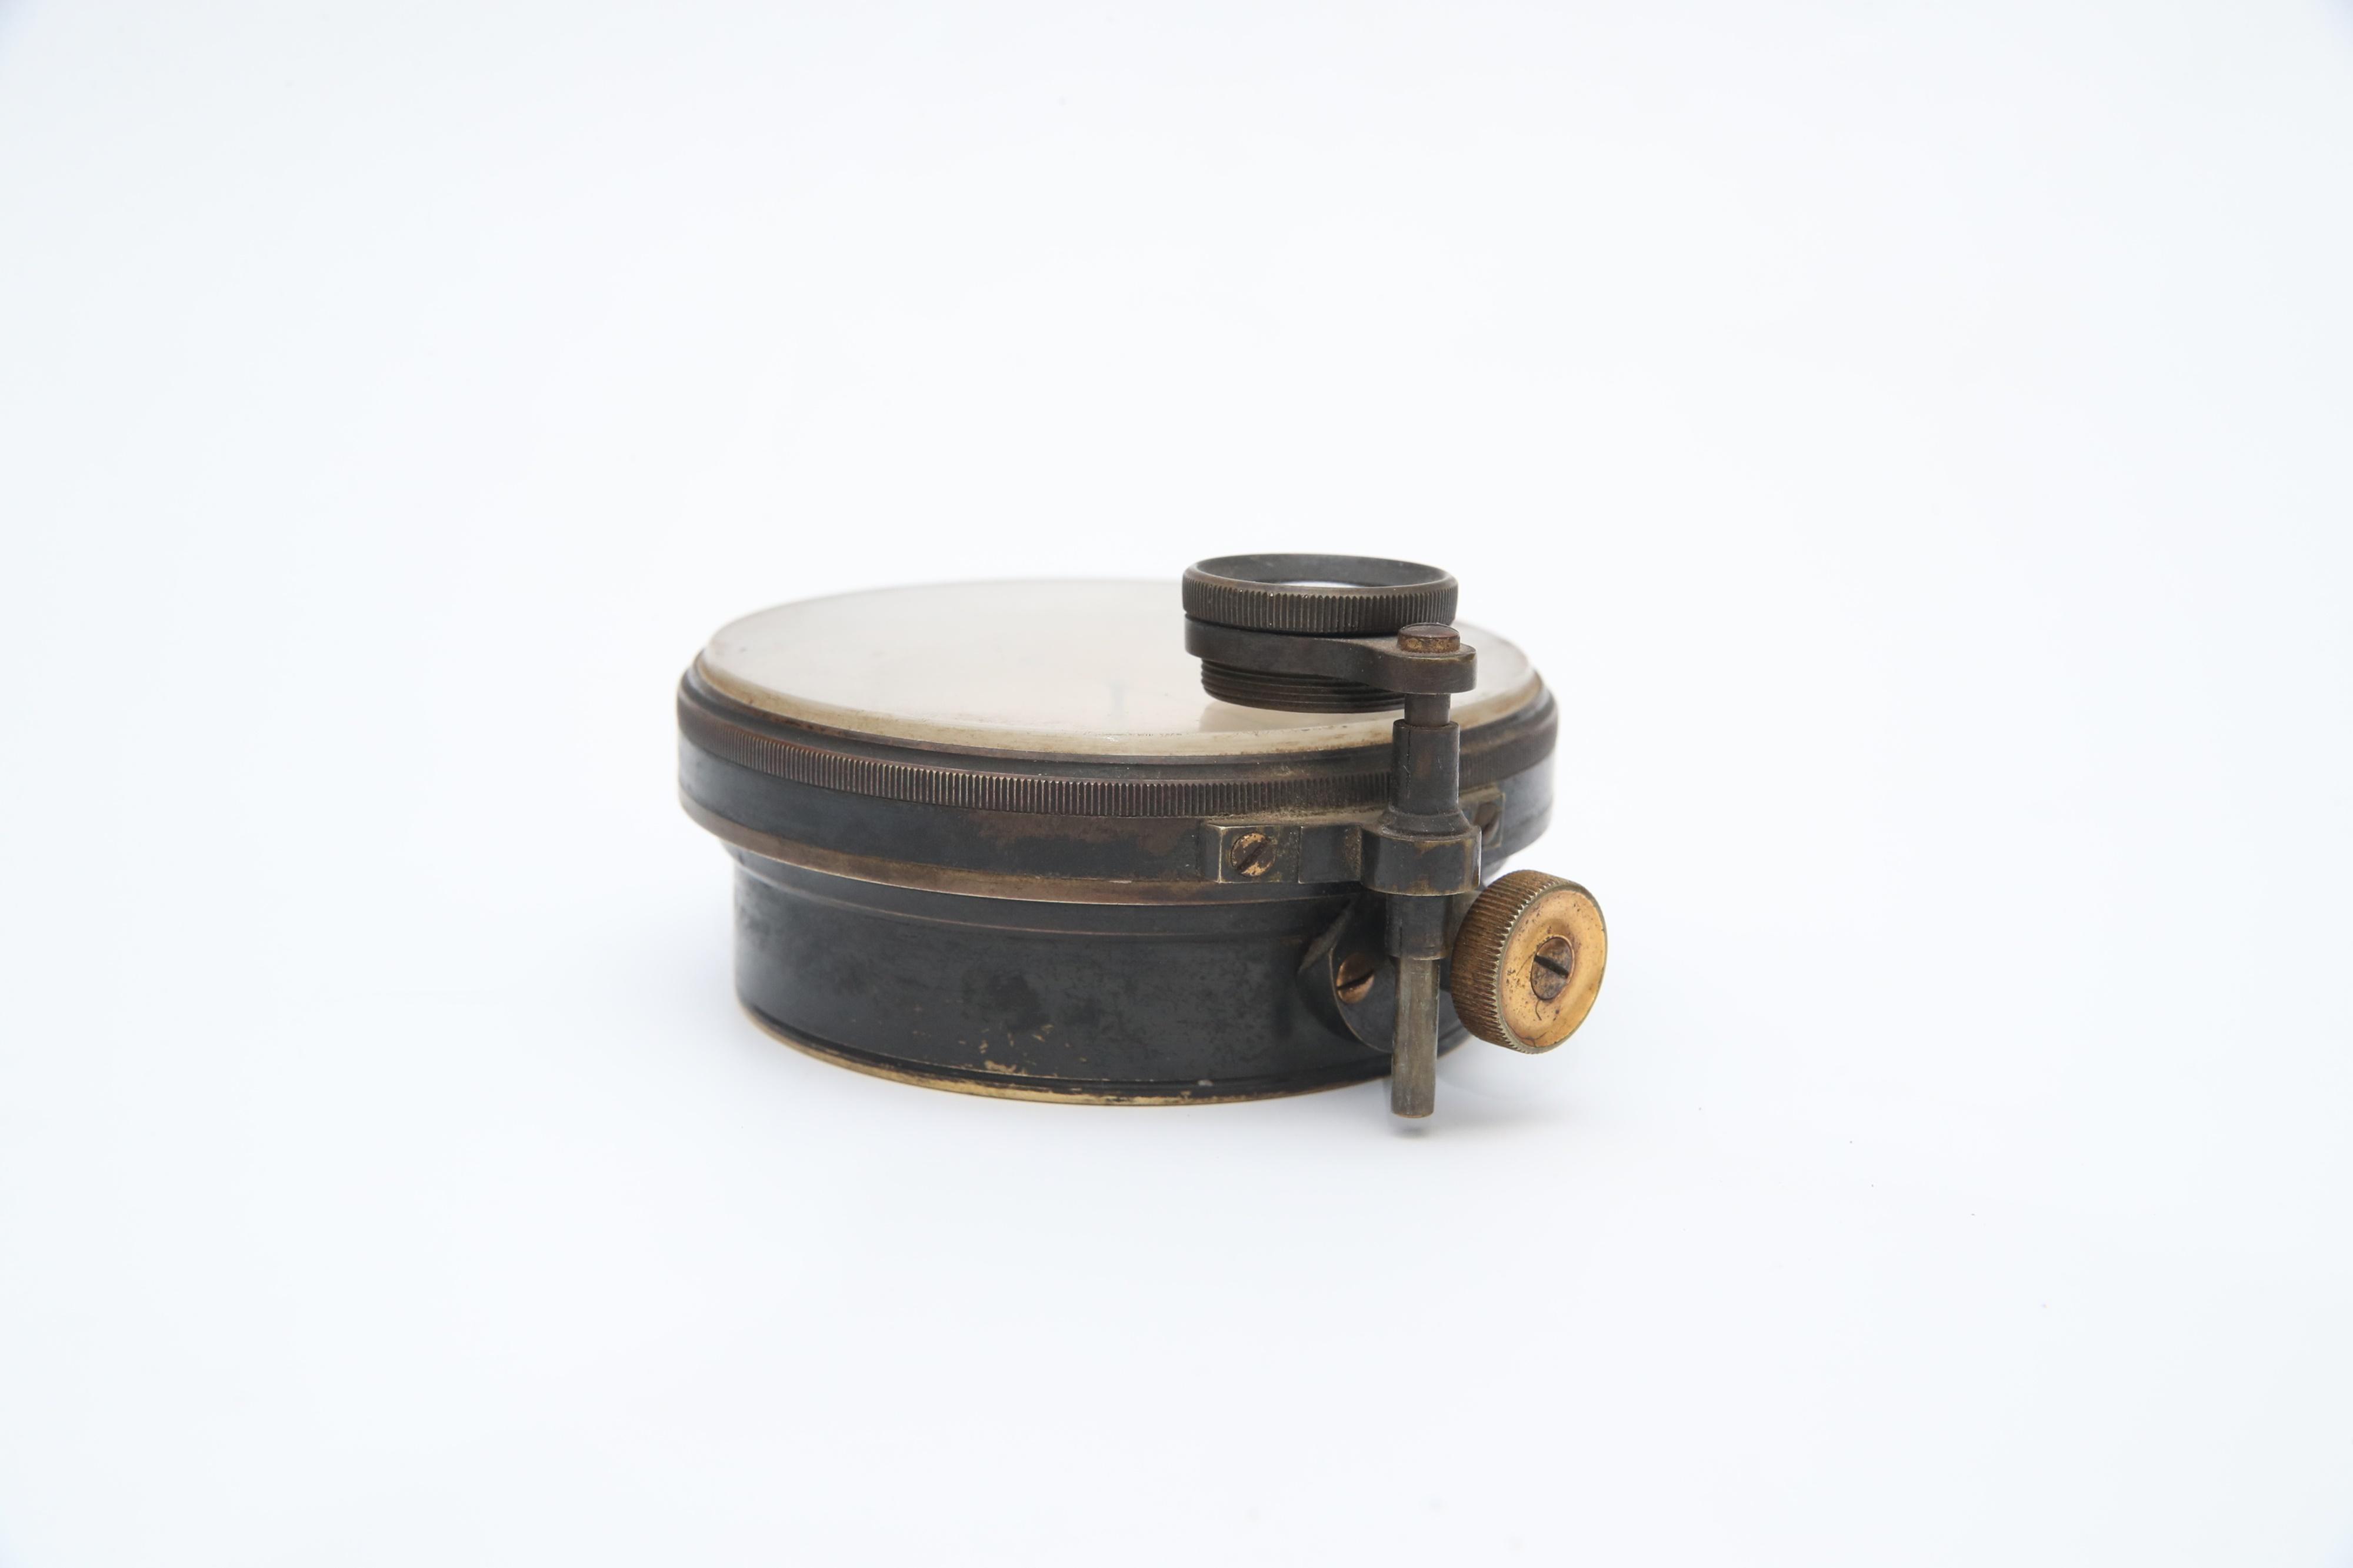 A Surveying Barometer, - Image 2 of 2